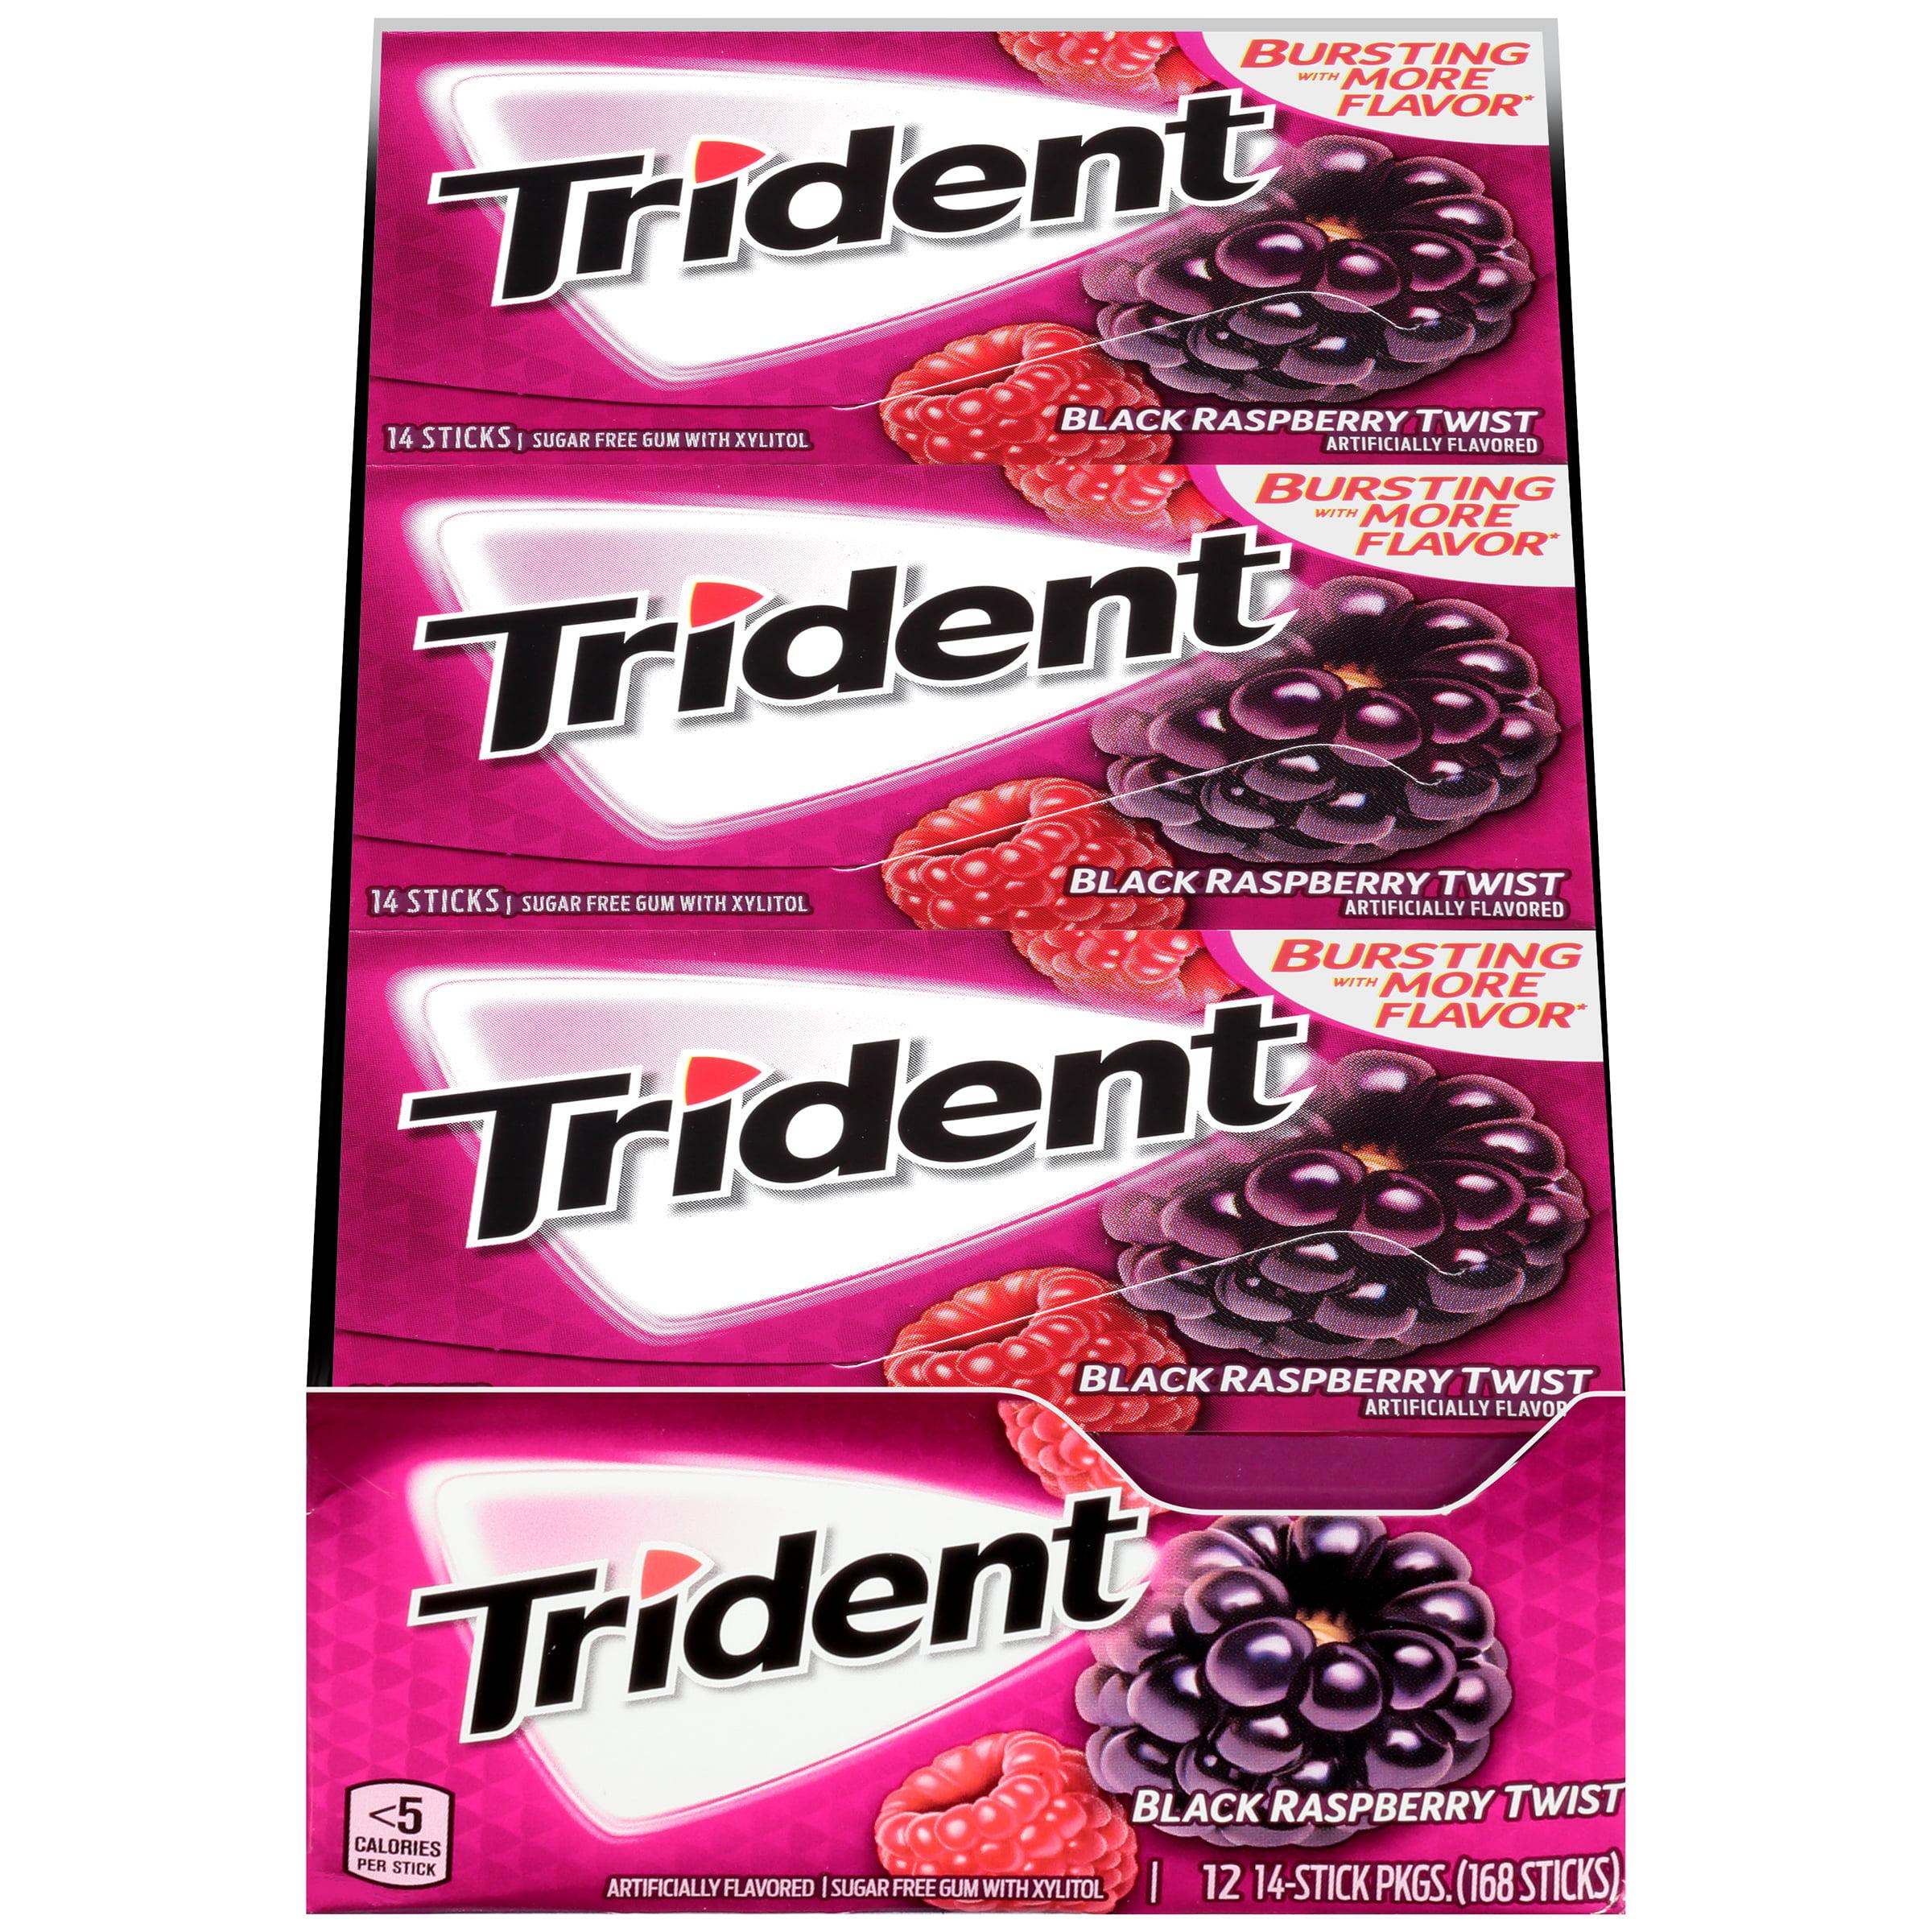 Trident, Sugar Free Black Raspberry Twist Chewing Gum, 14 Pcs, 12 Ct